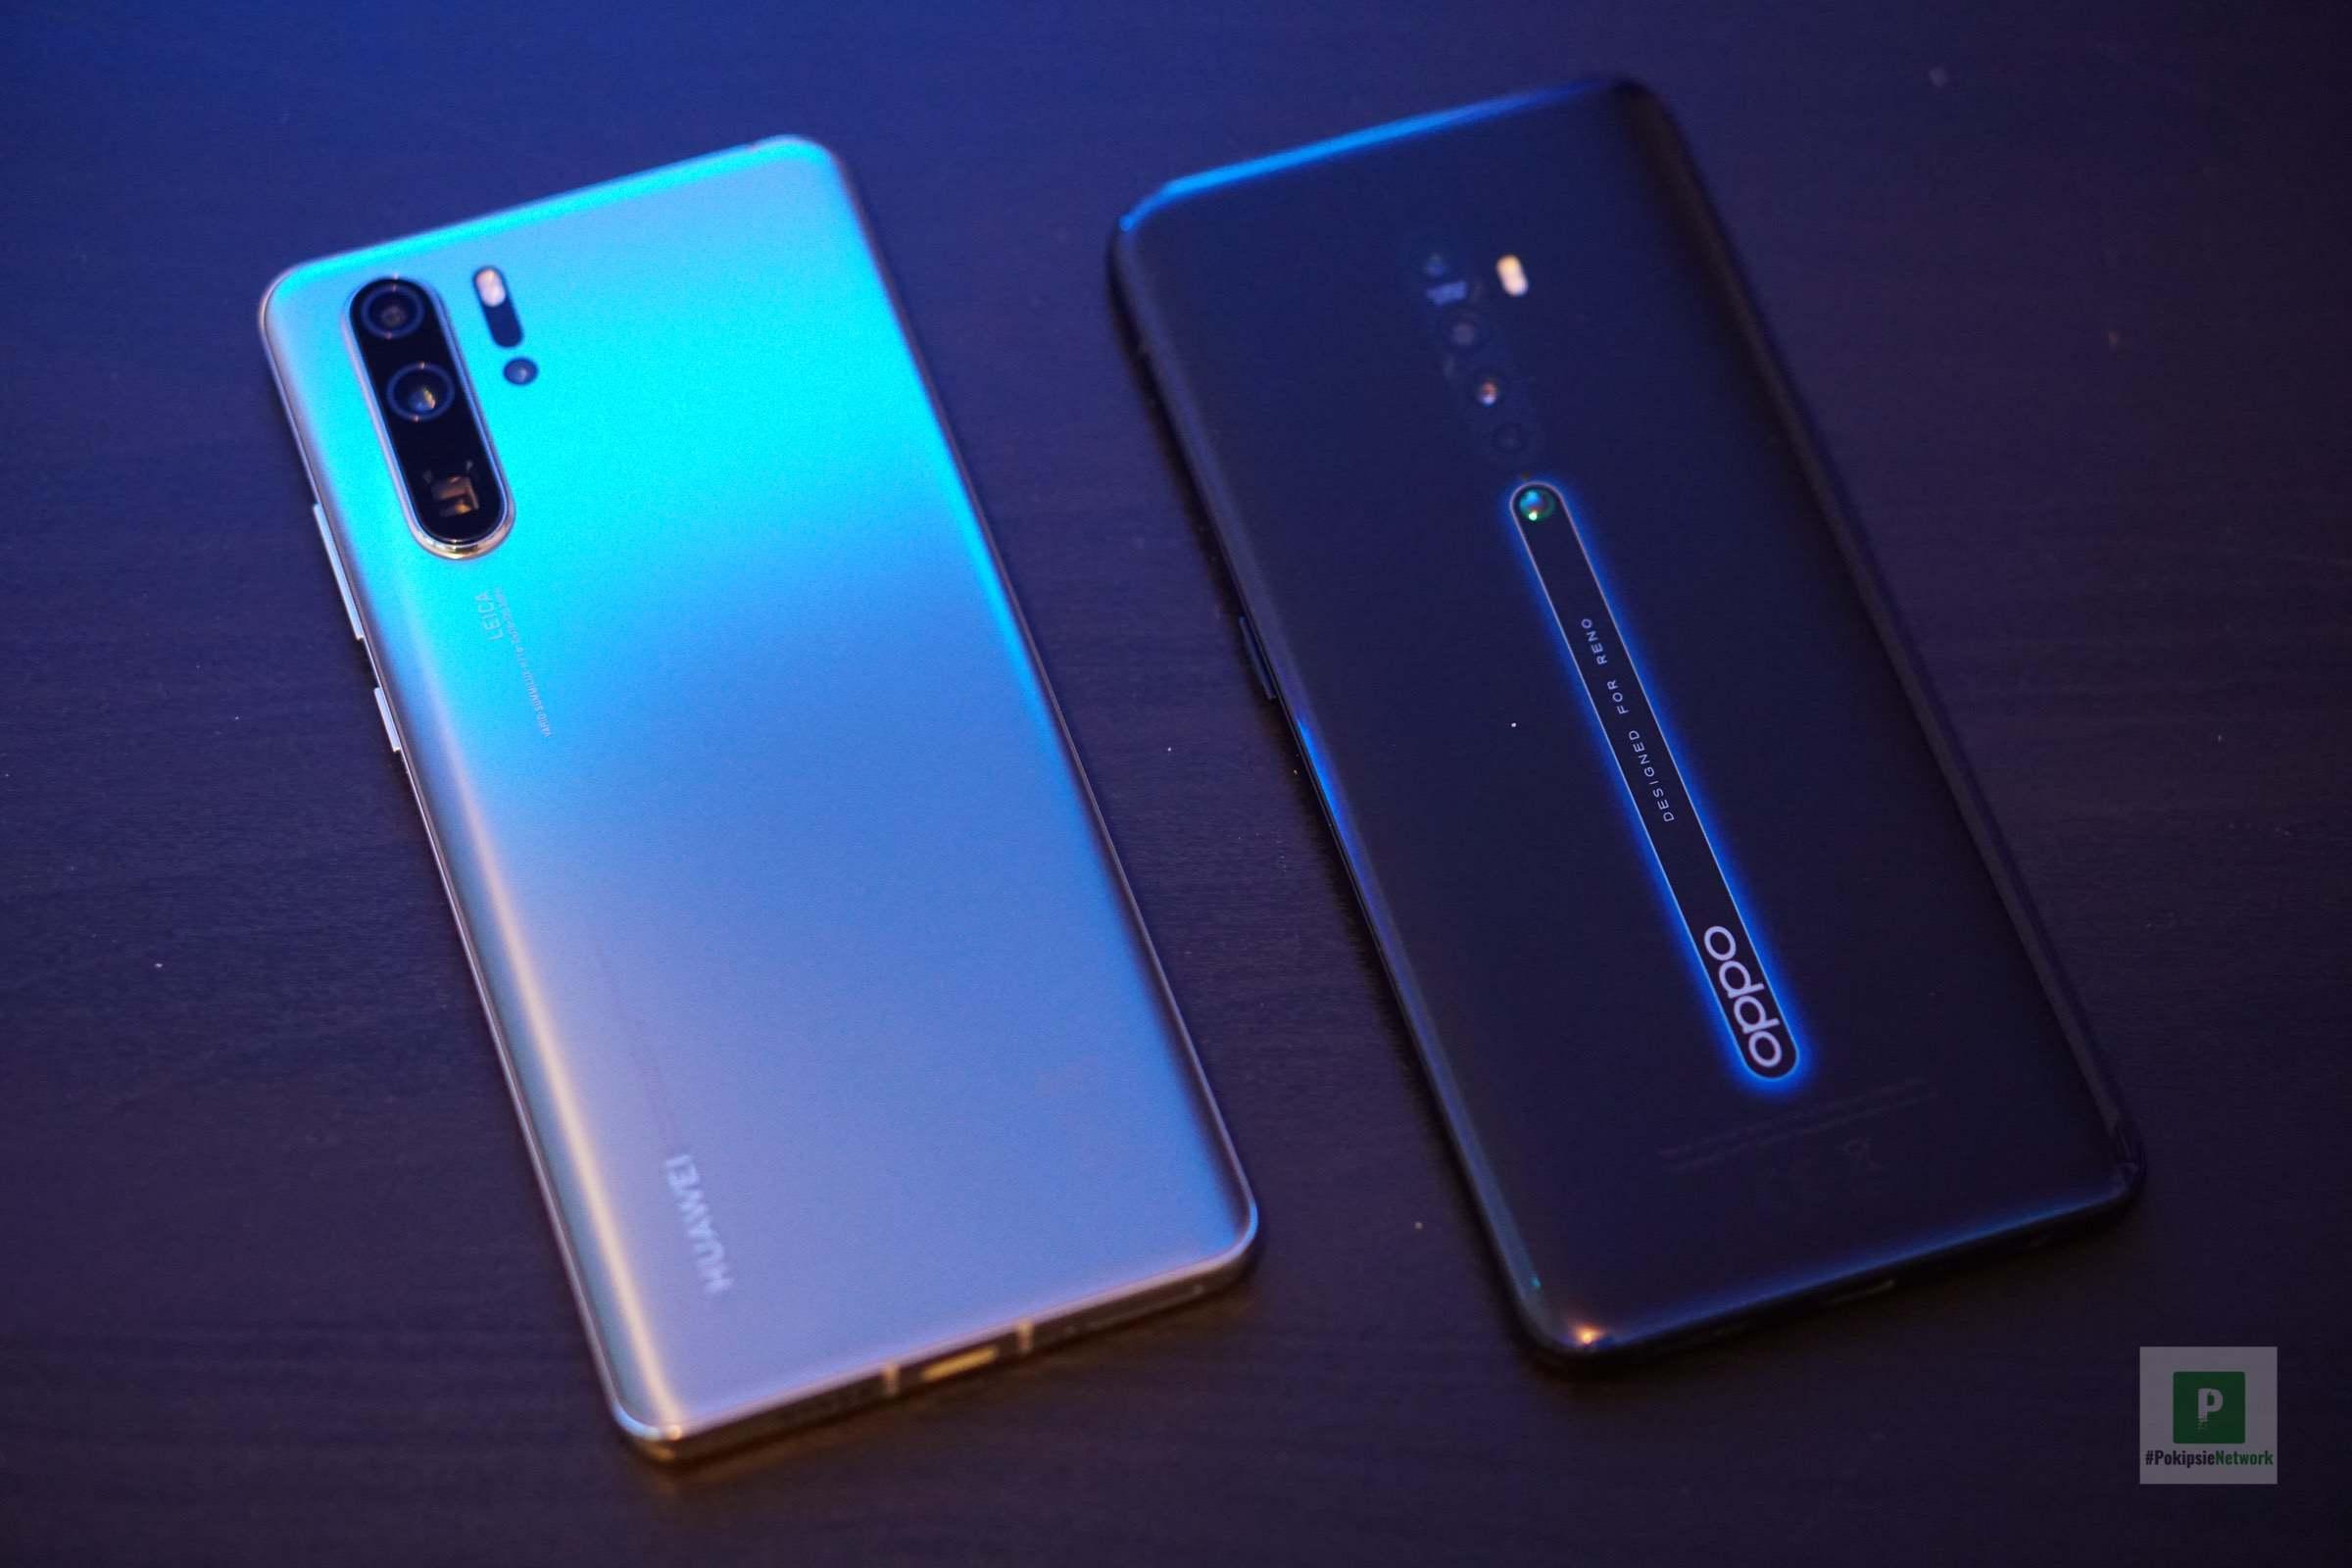 Meine Smartphone Favoriten 2020